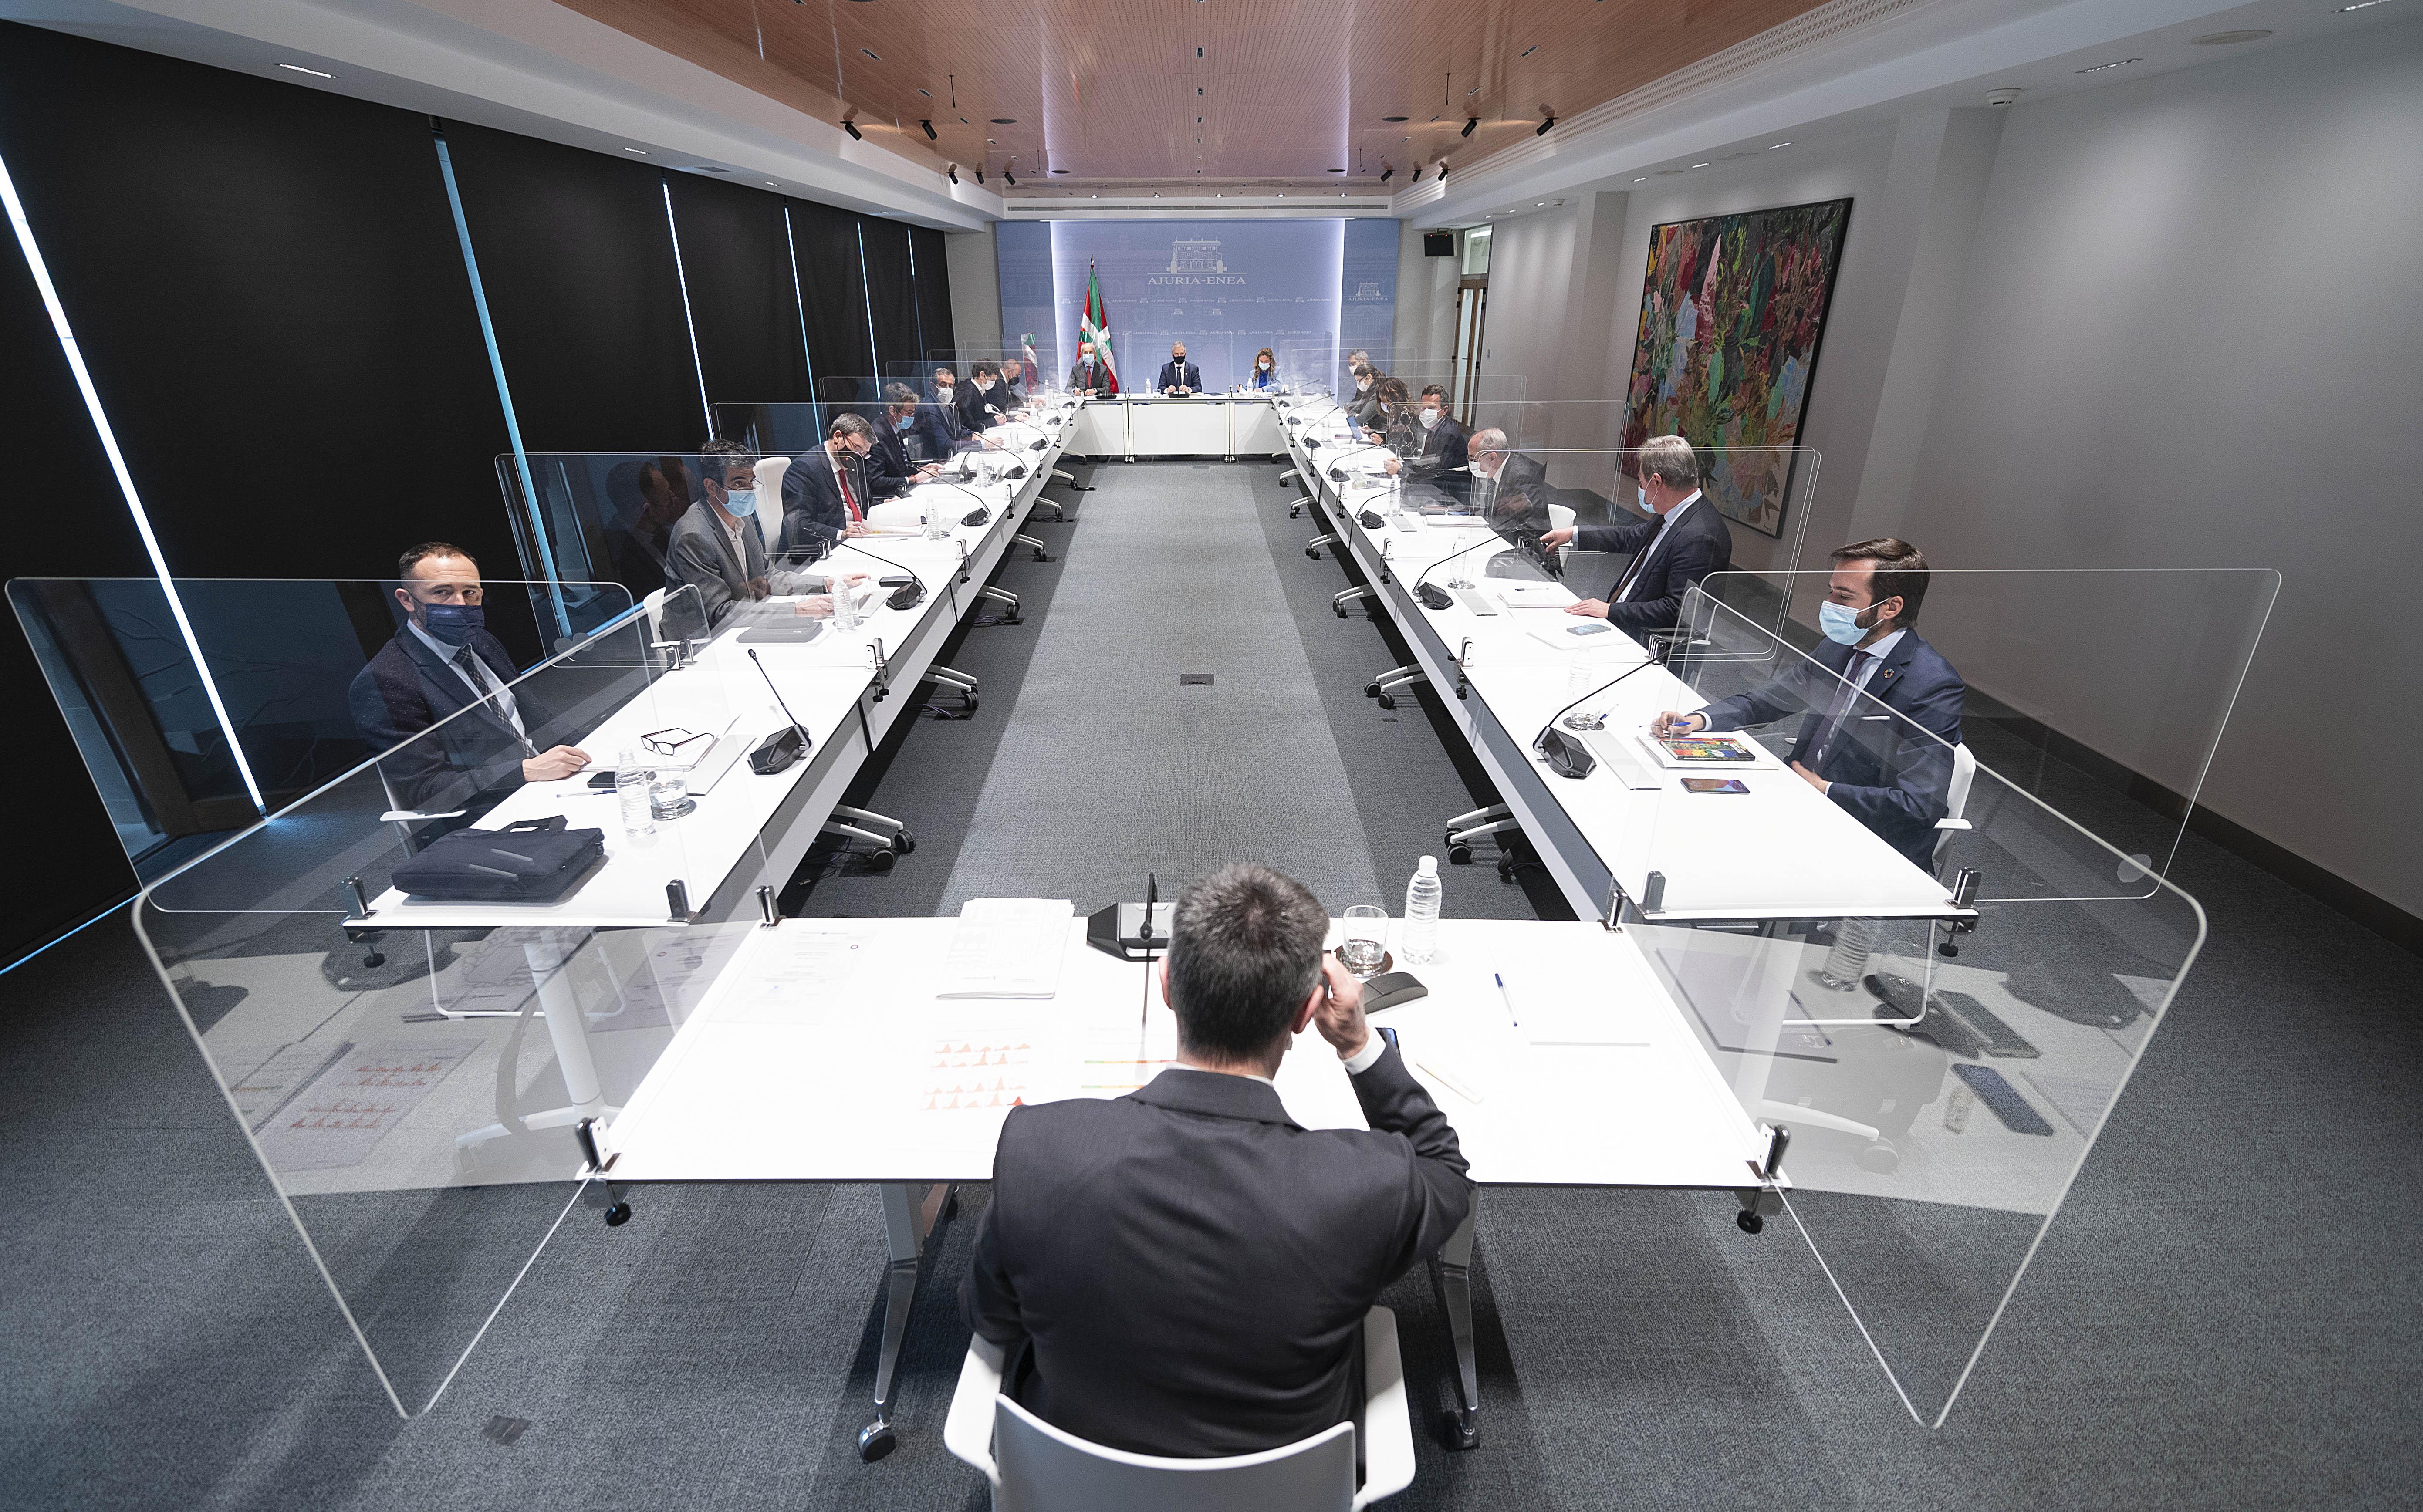 El Lehendakari preside la reunión del Comité Asesor del LABI [1:44]